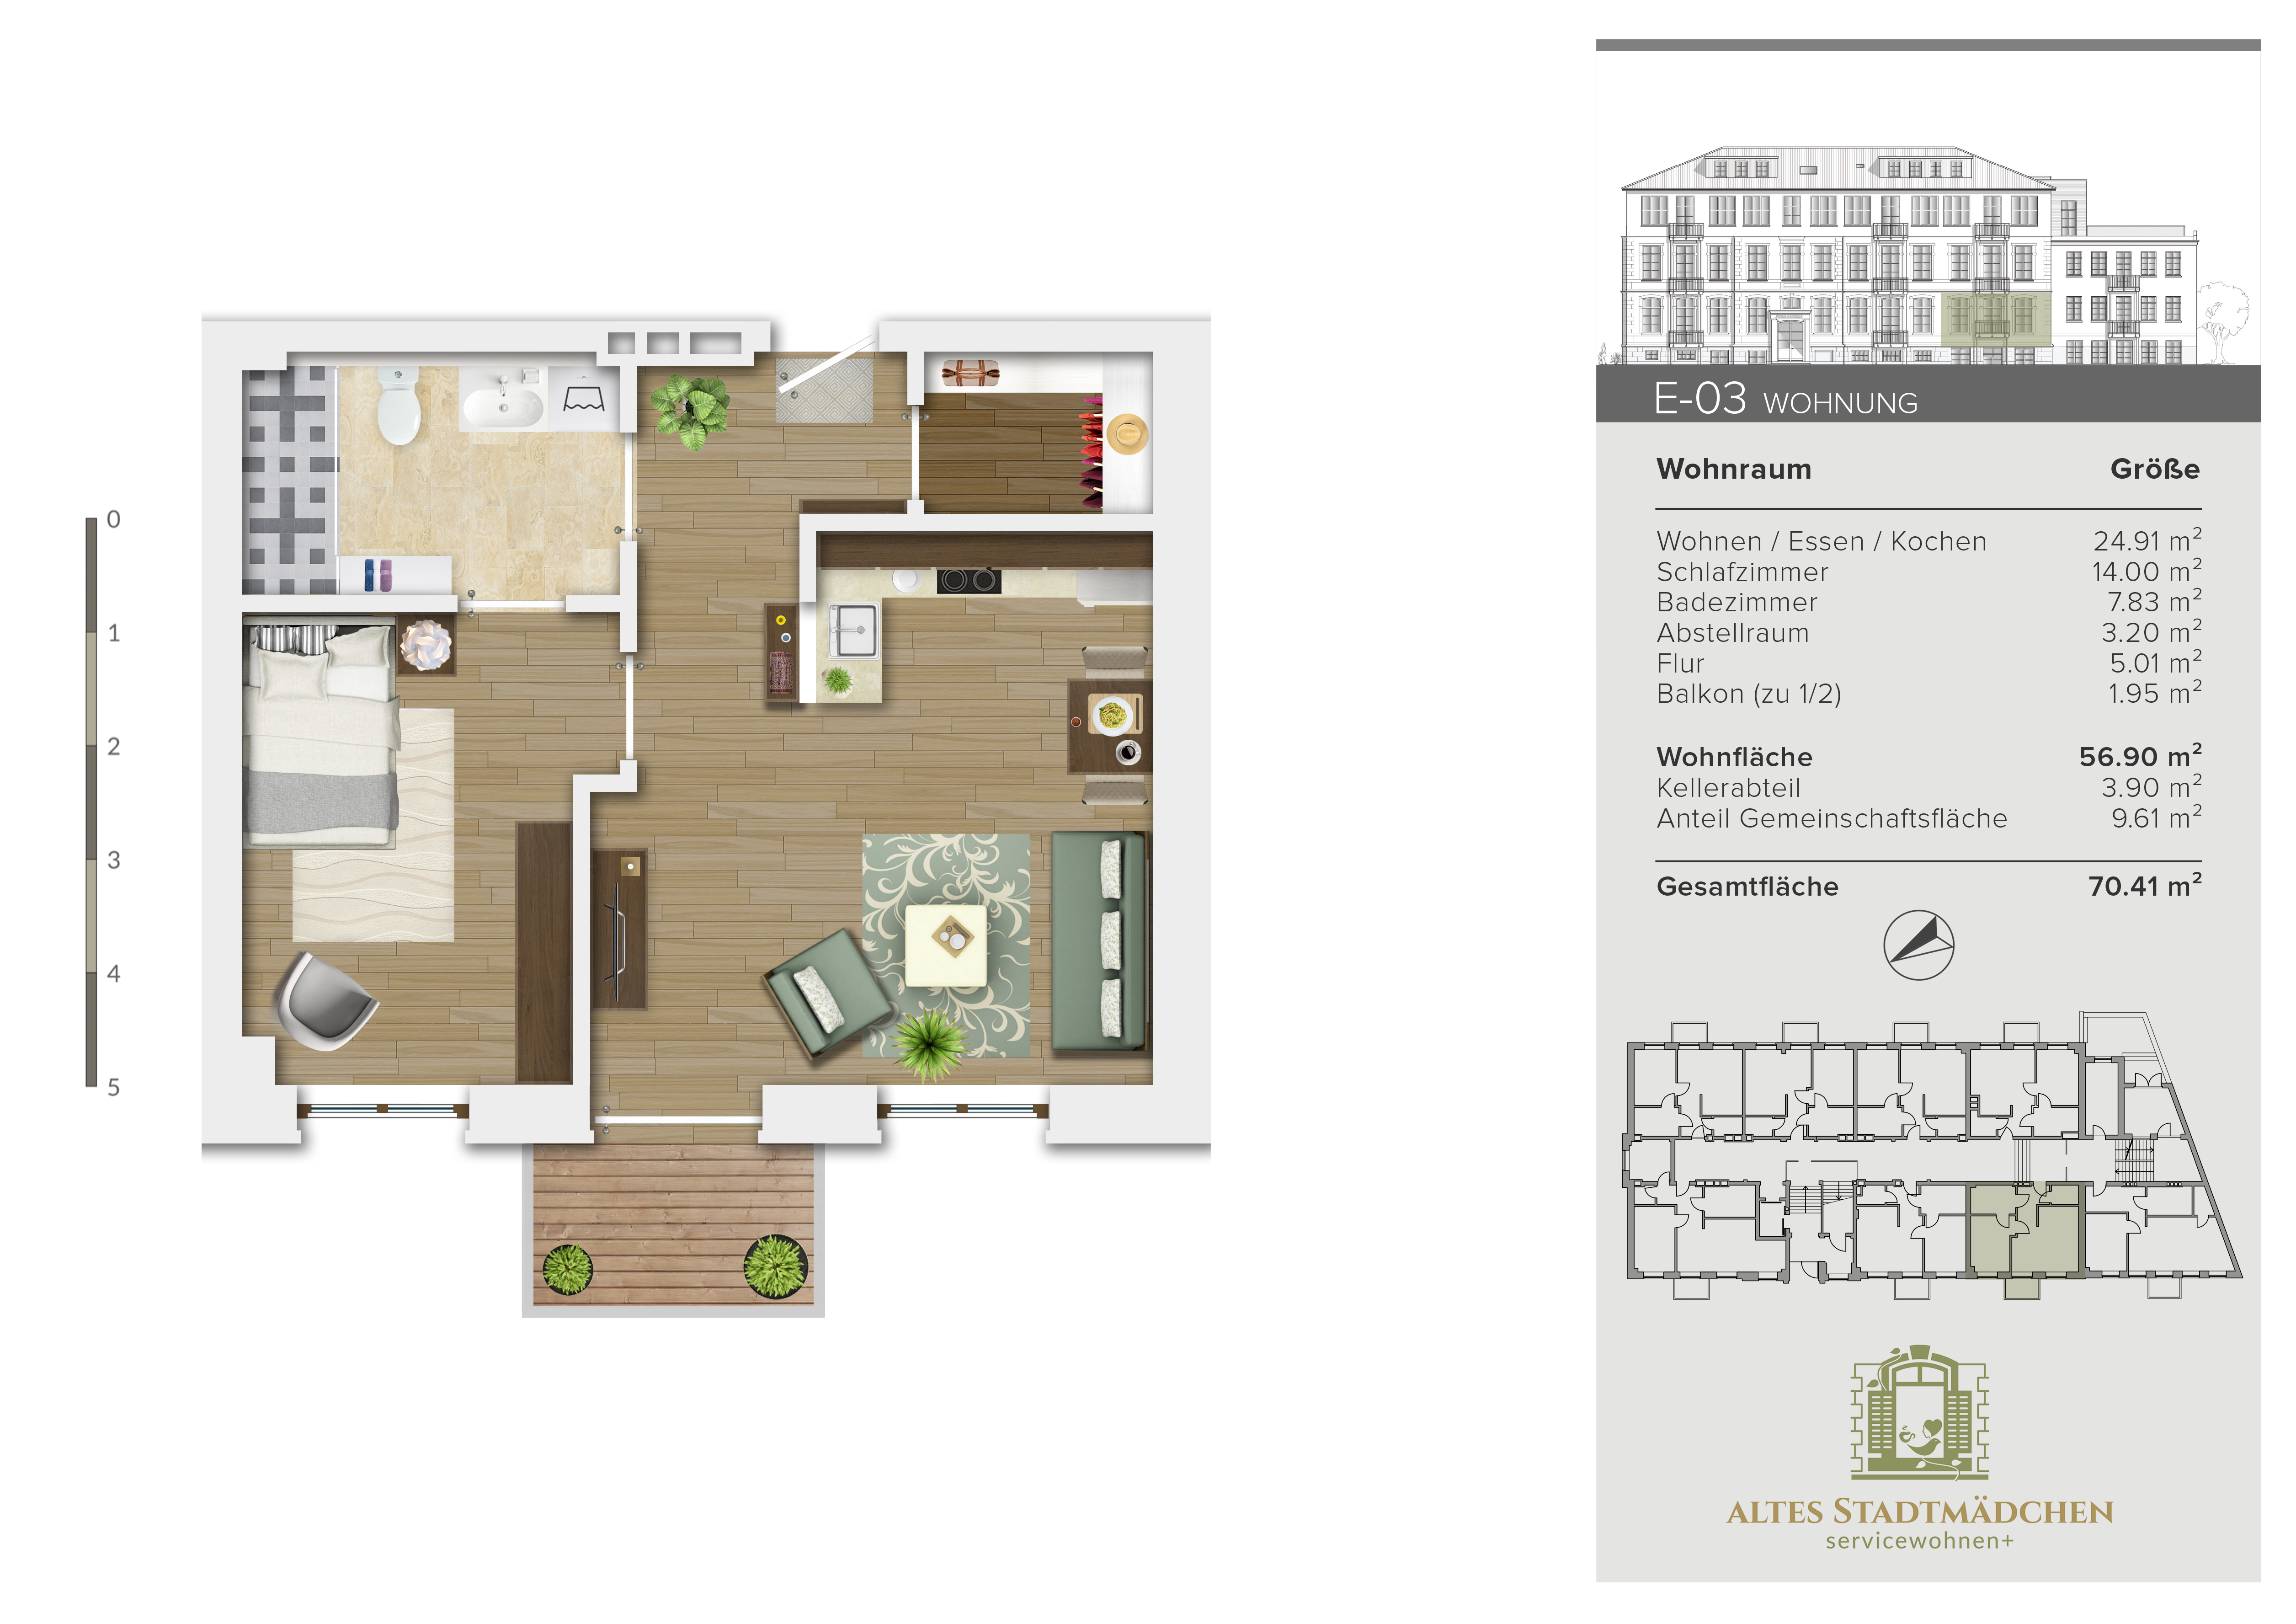 Wohnung E-03